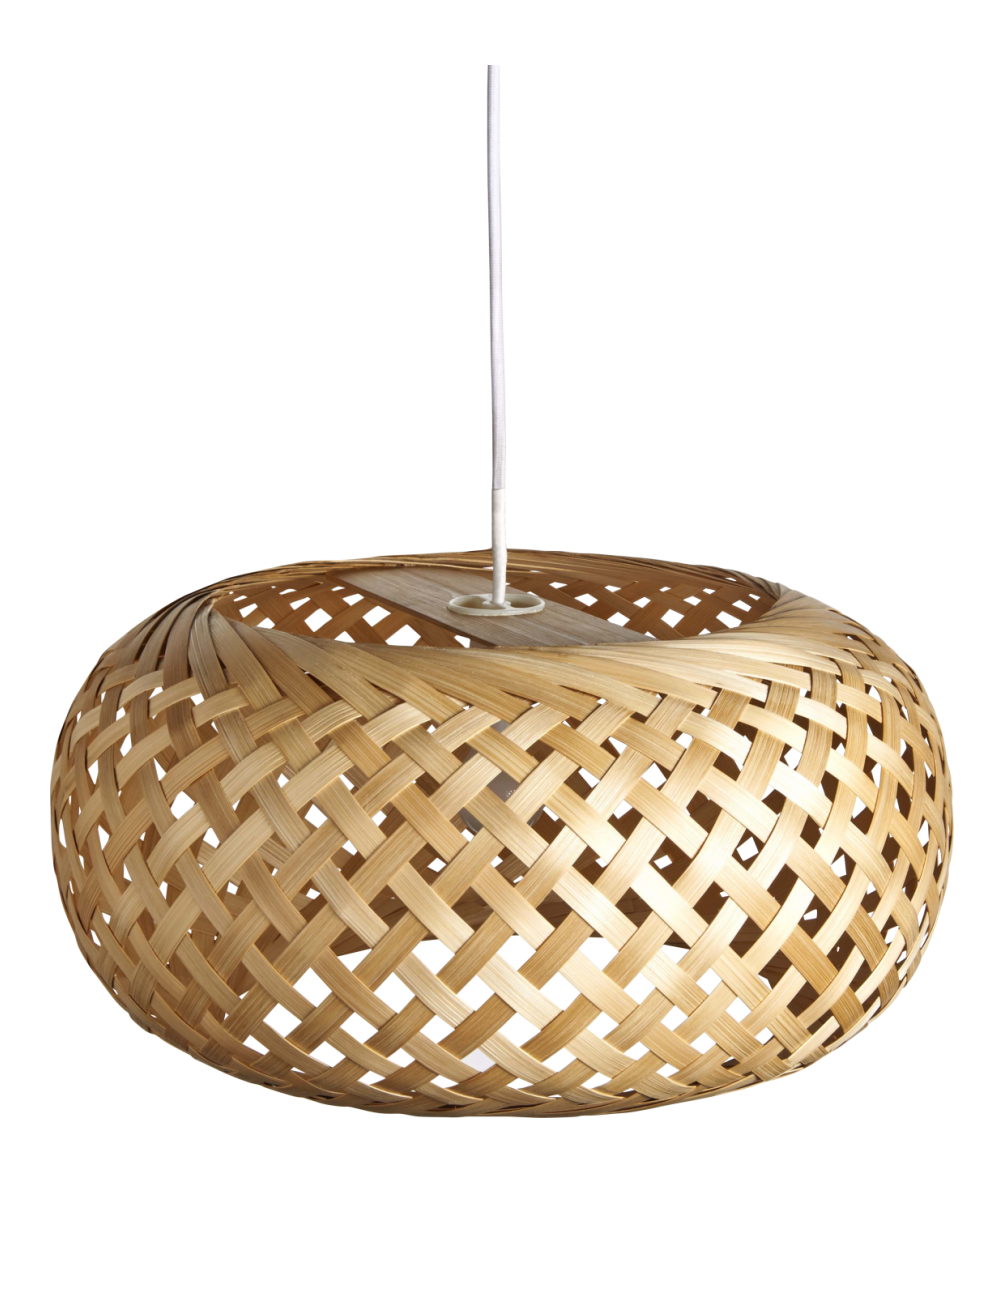 Bamboo Woven Bamboo Lampshade Habitat Bamboo Lamp Lampshade